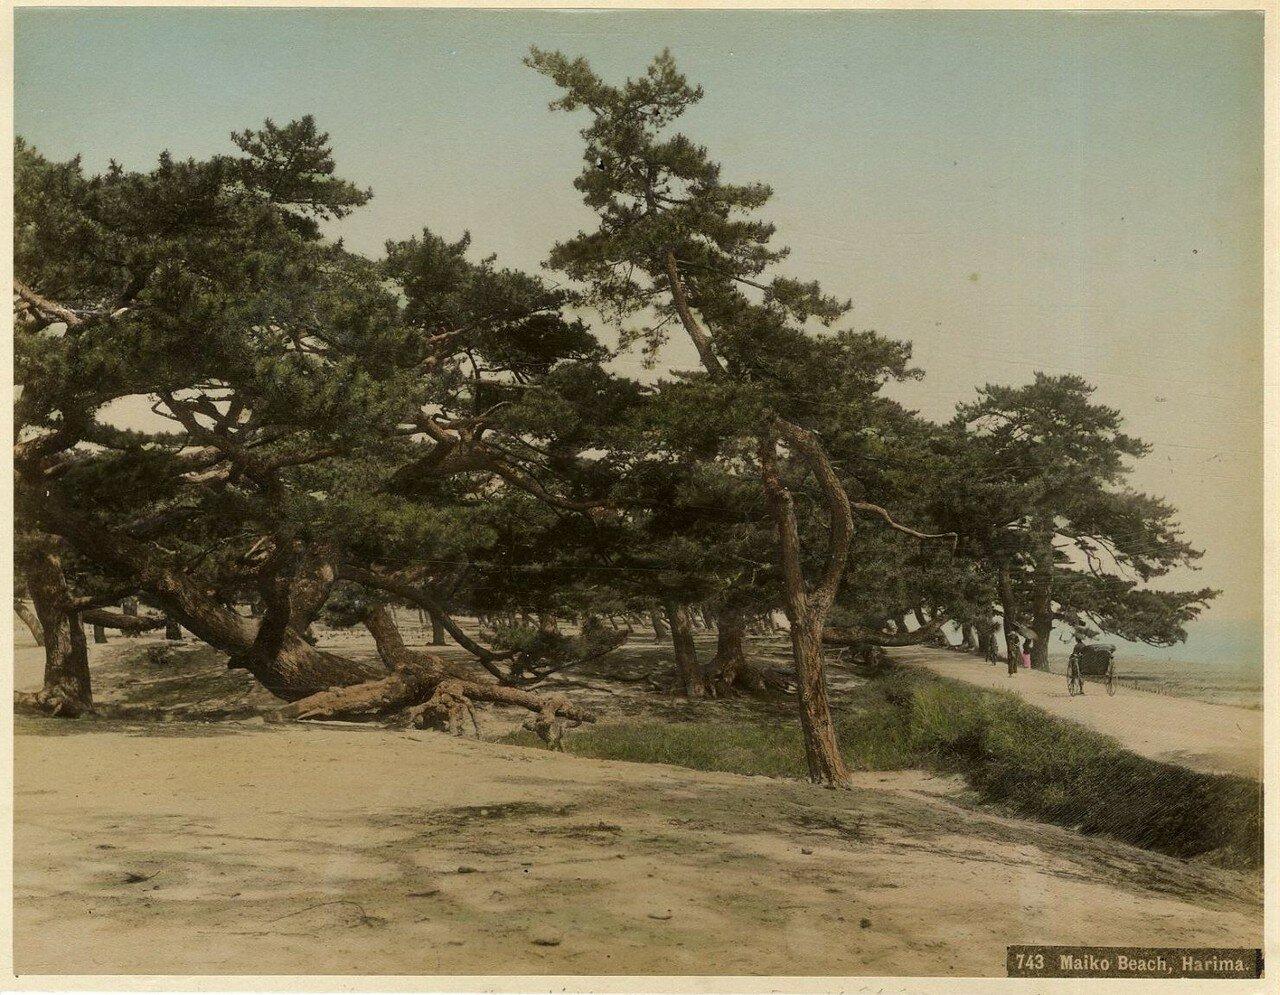 Харима. Пляж Майко